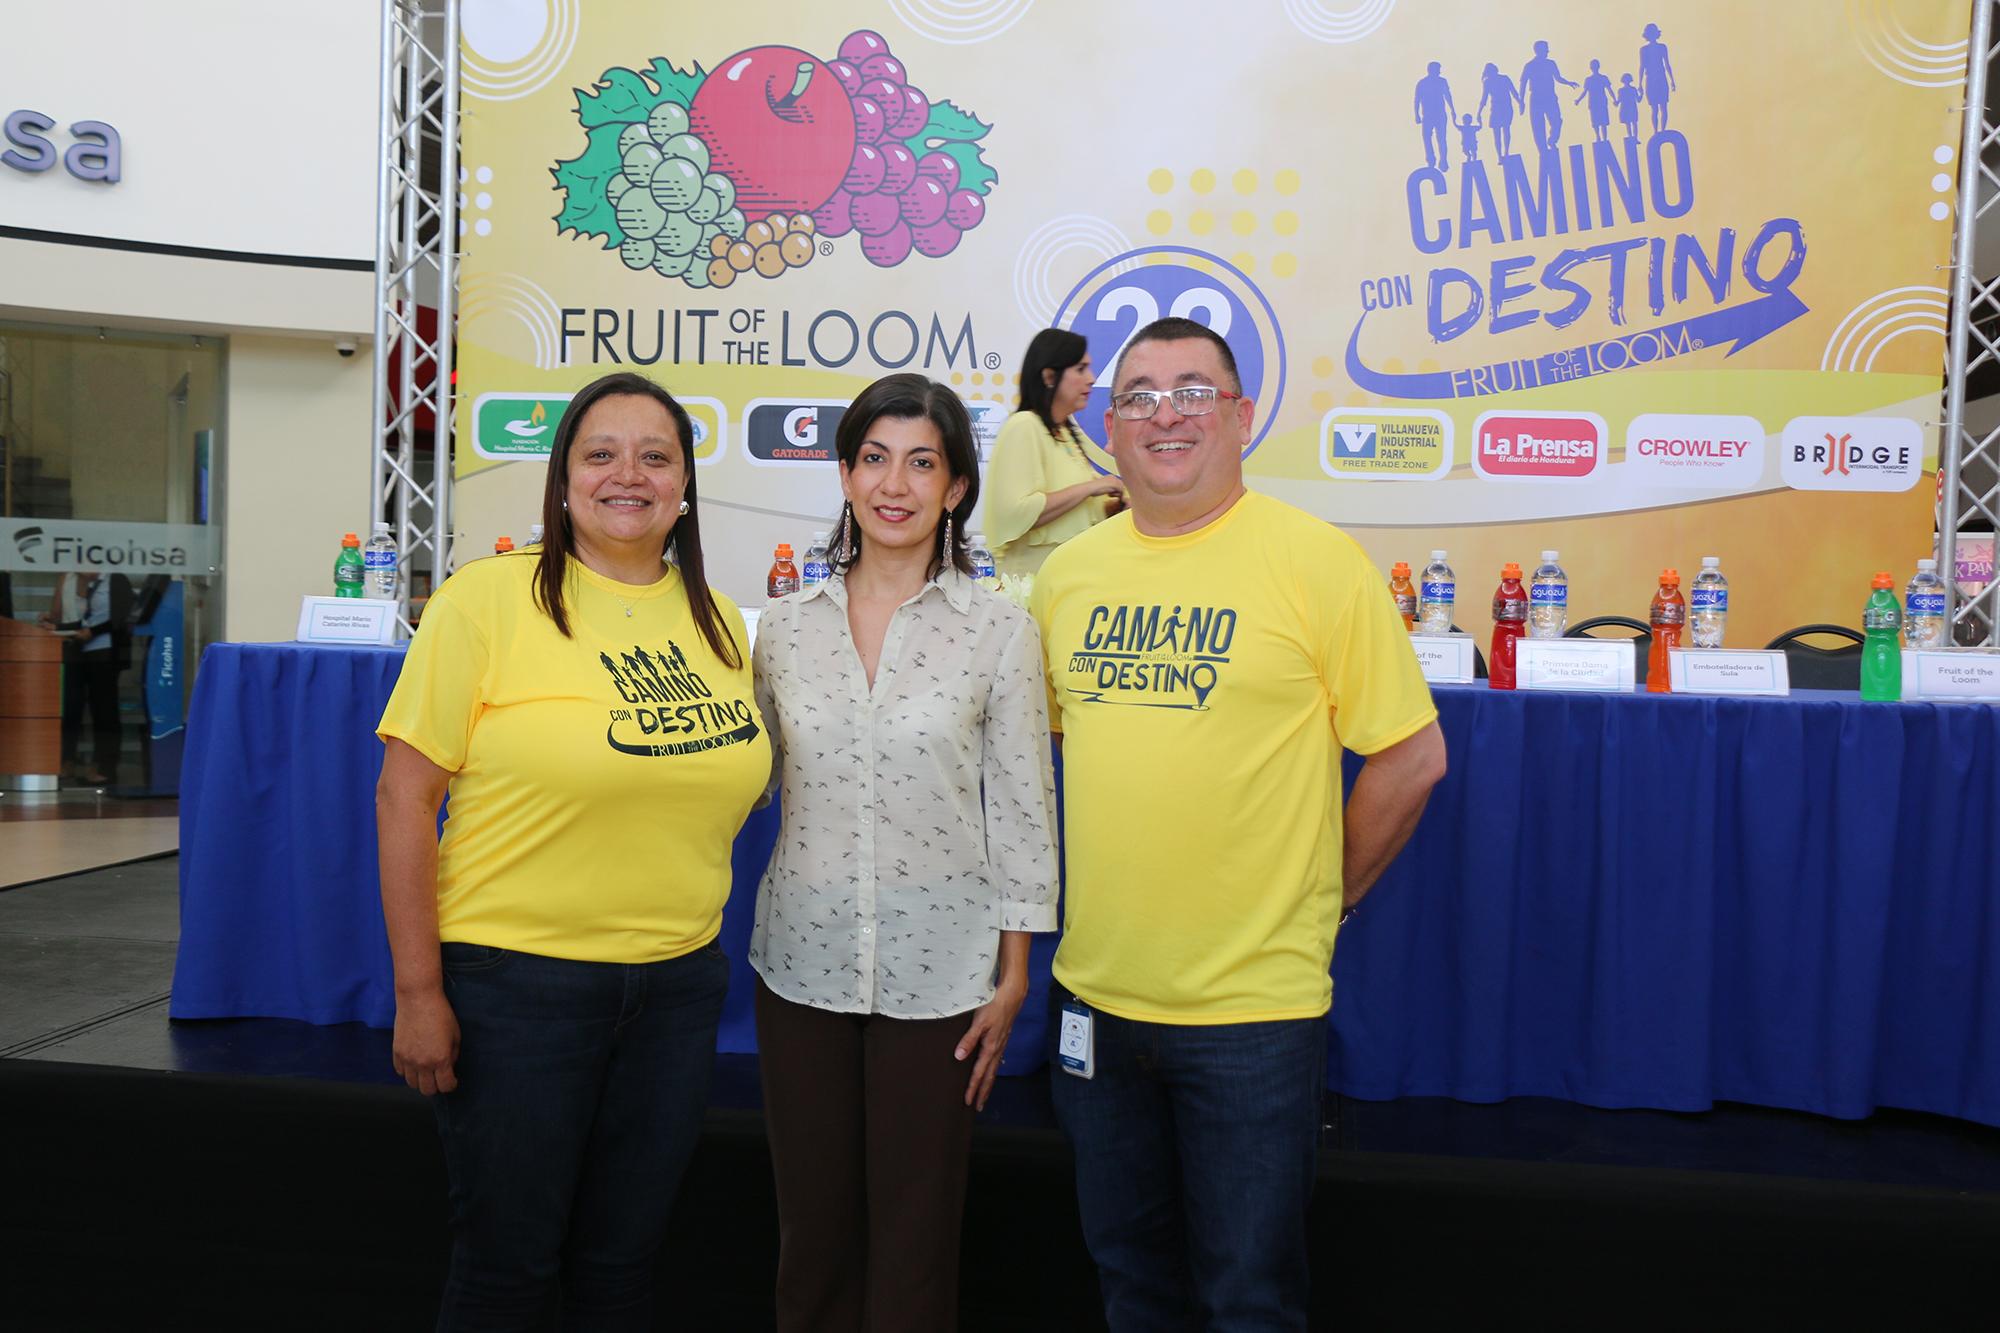 FRUIT OF THE LOOM ORGANIZA SEXTA CAMINATA FAMILIAR A FAVOR DE SALA DE EMERGENCIAS DE HOSPITAL «MARIO C. RIVAS»